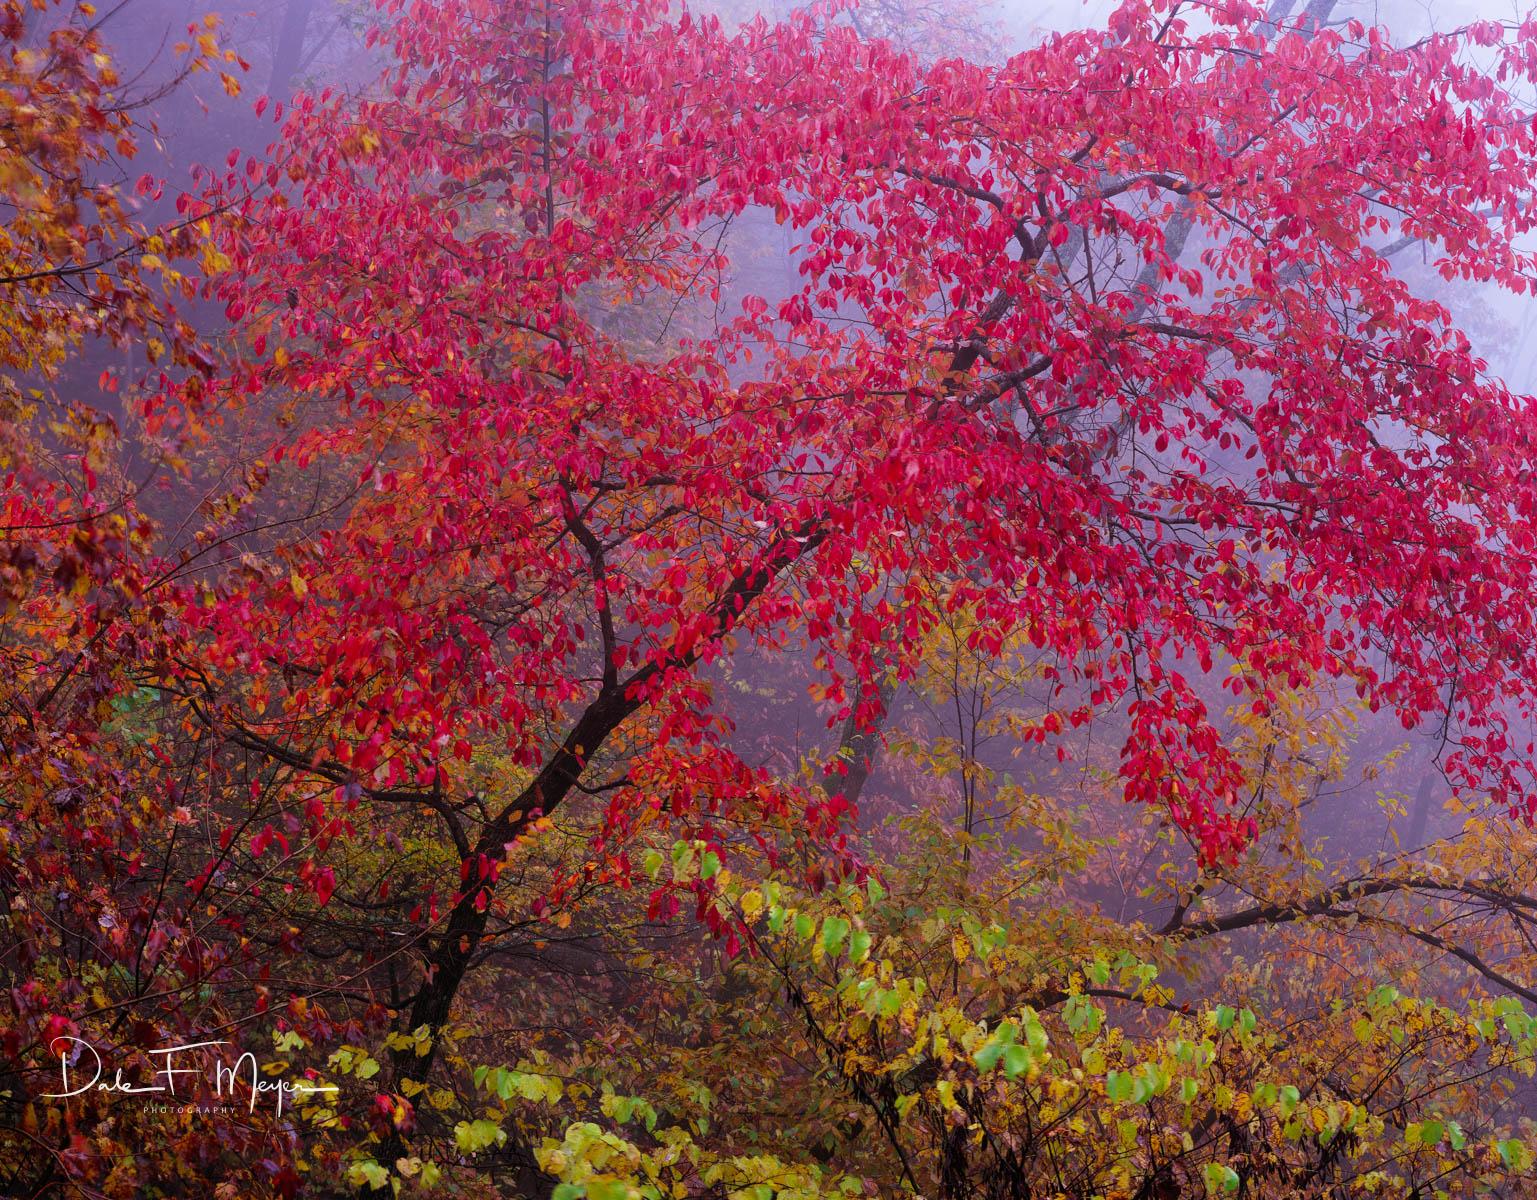 4X5 Fuji 50 Slide Film,Gum Tree,North Arkansas,Ozark National Forrest,fall,fog